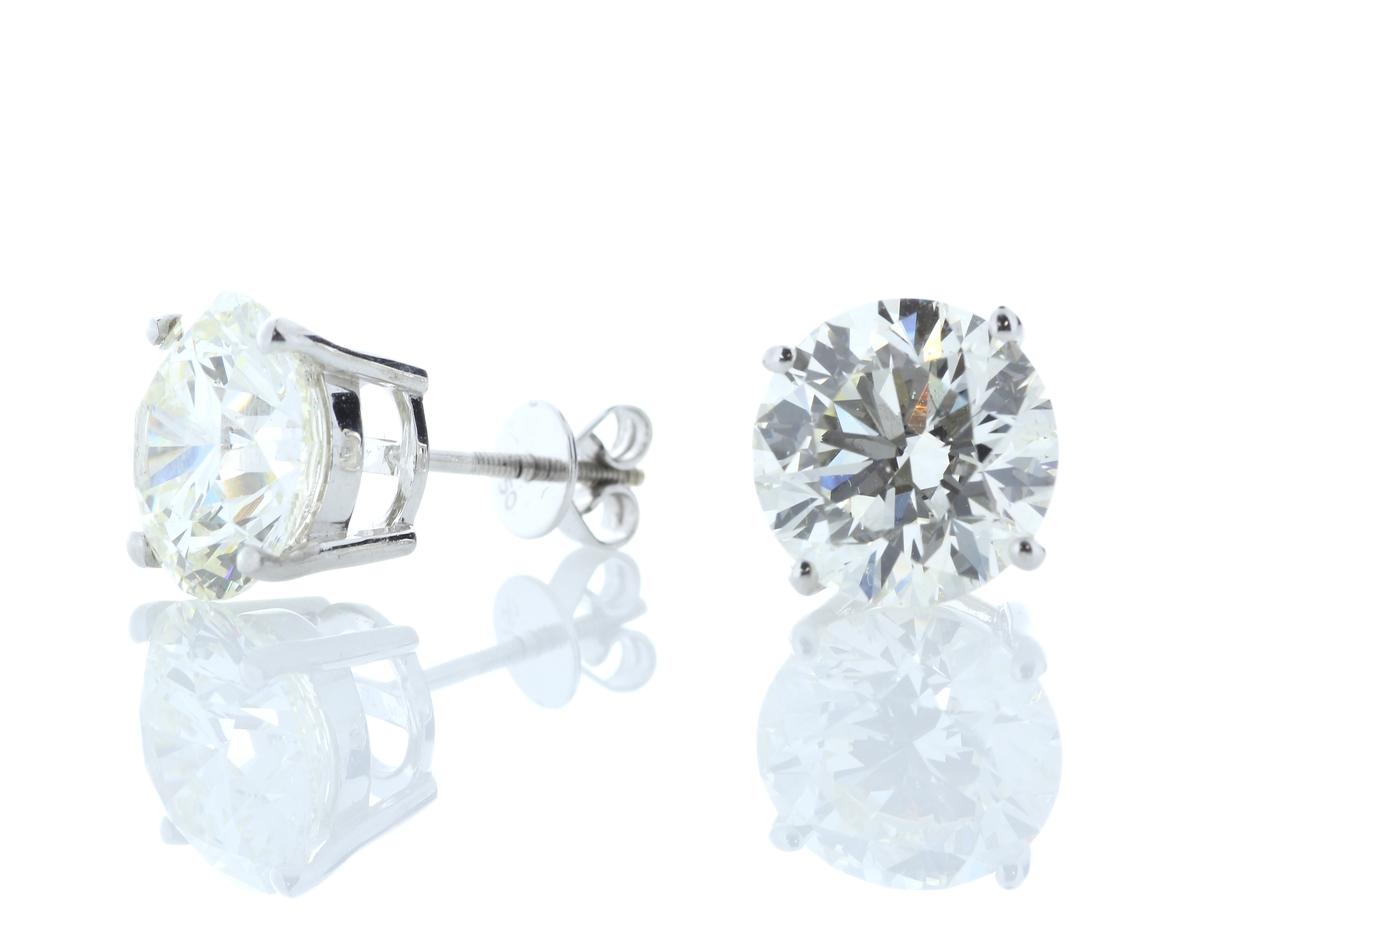 18ct White Gold Prong Set Diamond Earring 11.00 Carats - Image 2 of 3